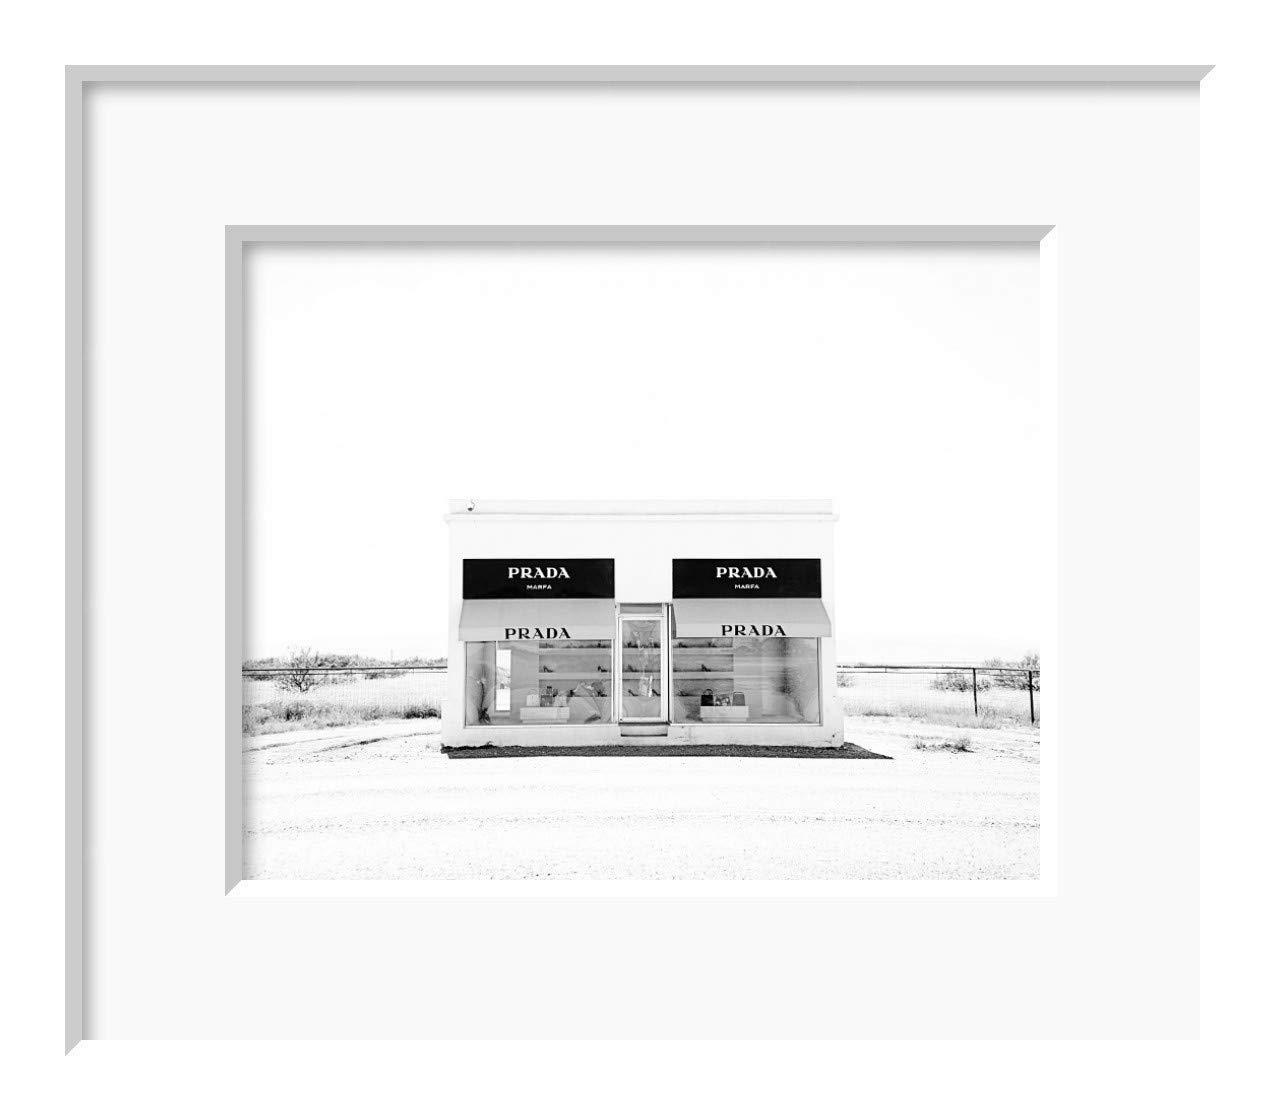 Prada Marfa Black and White Photograph 8x10 inch print